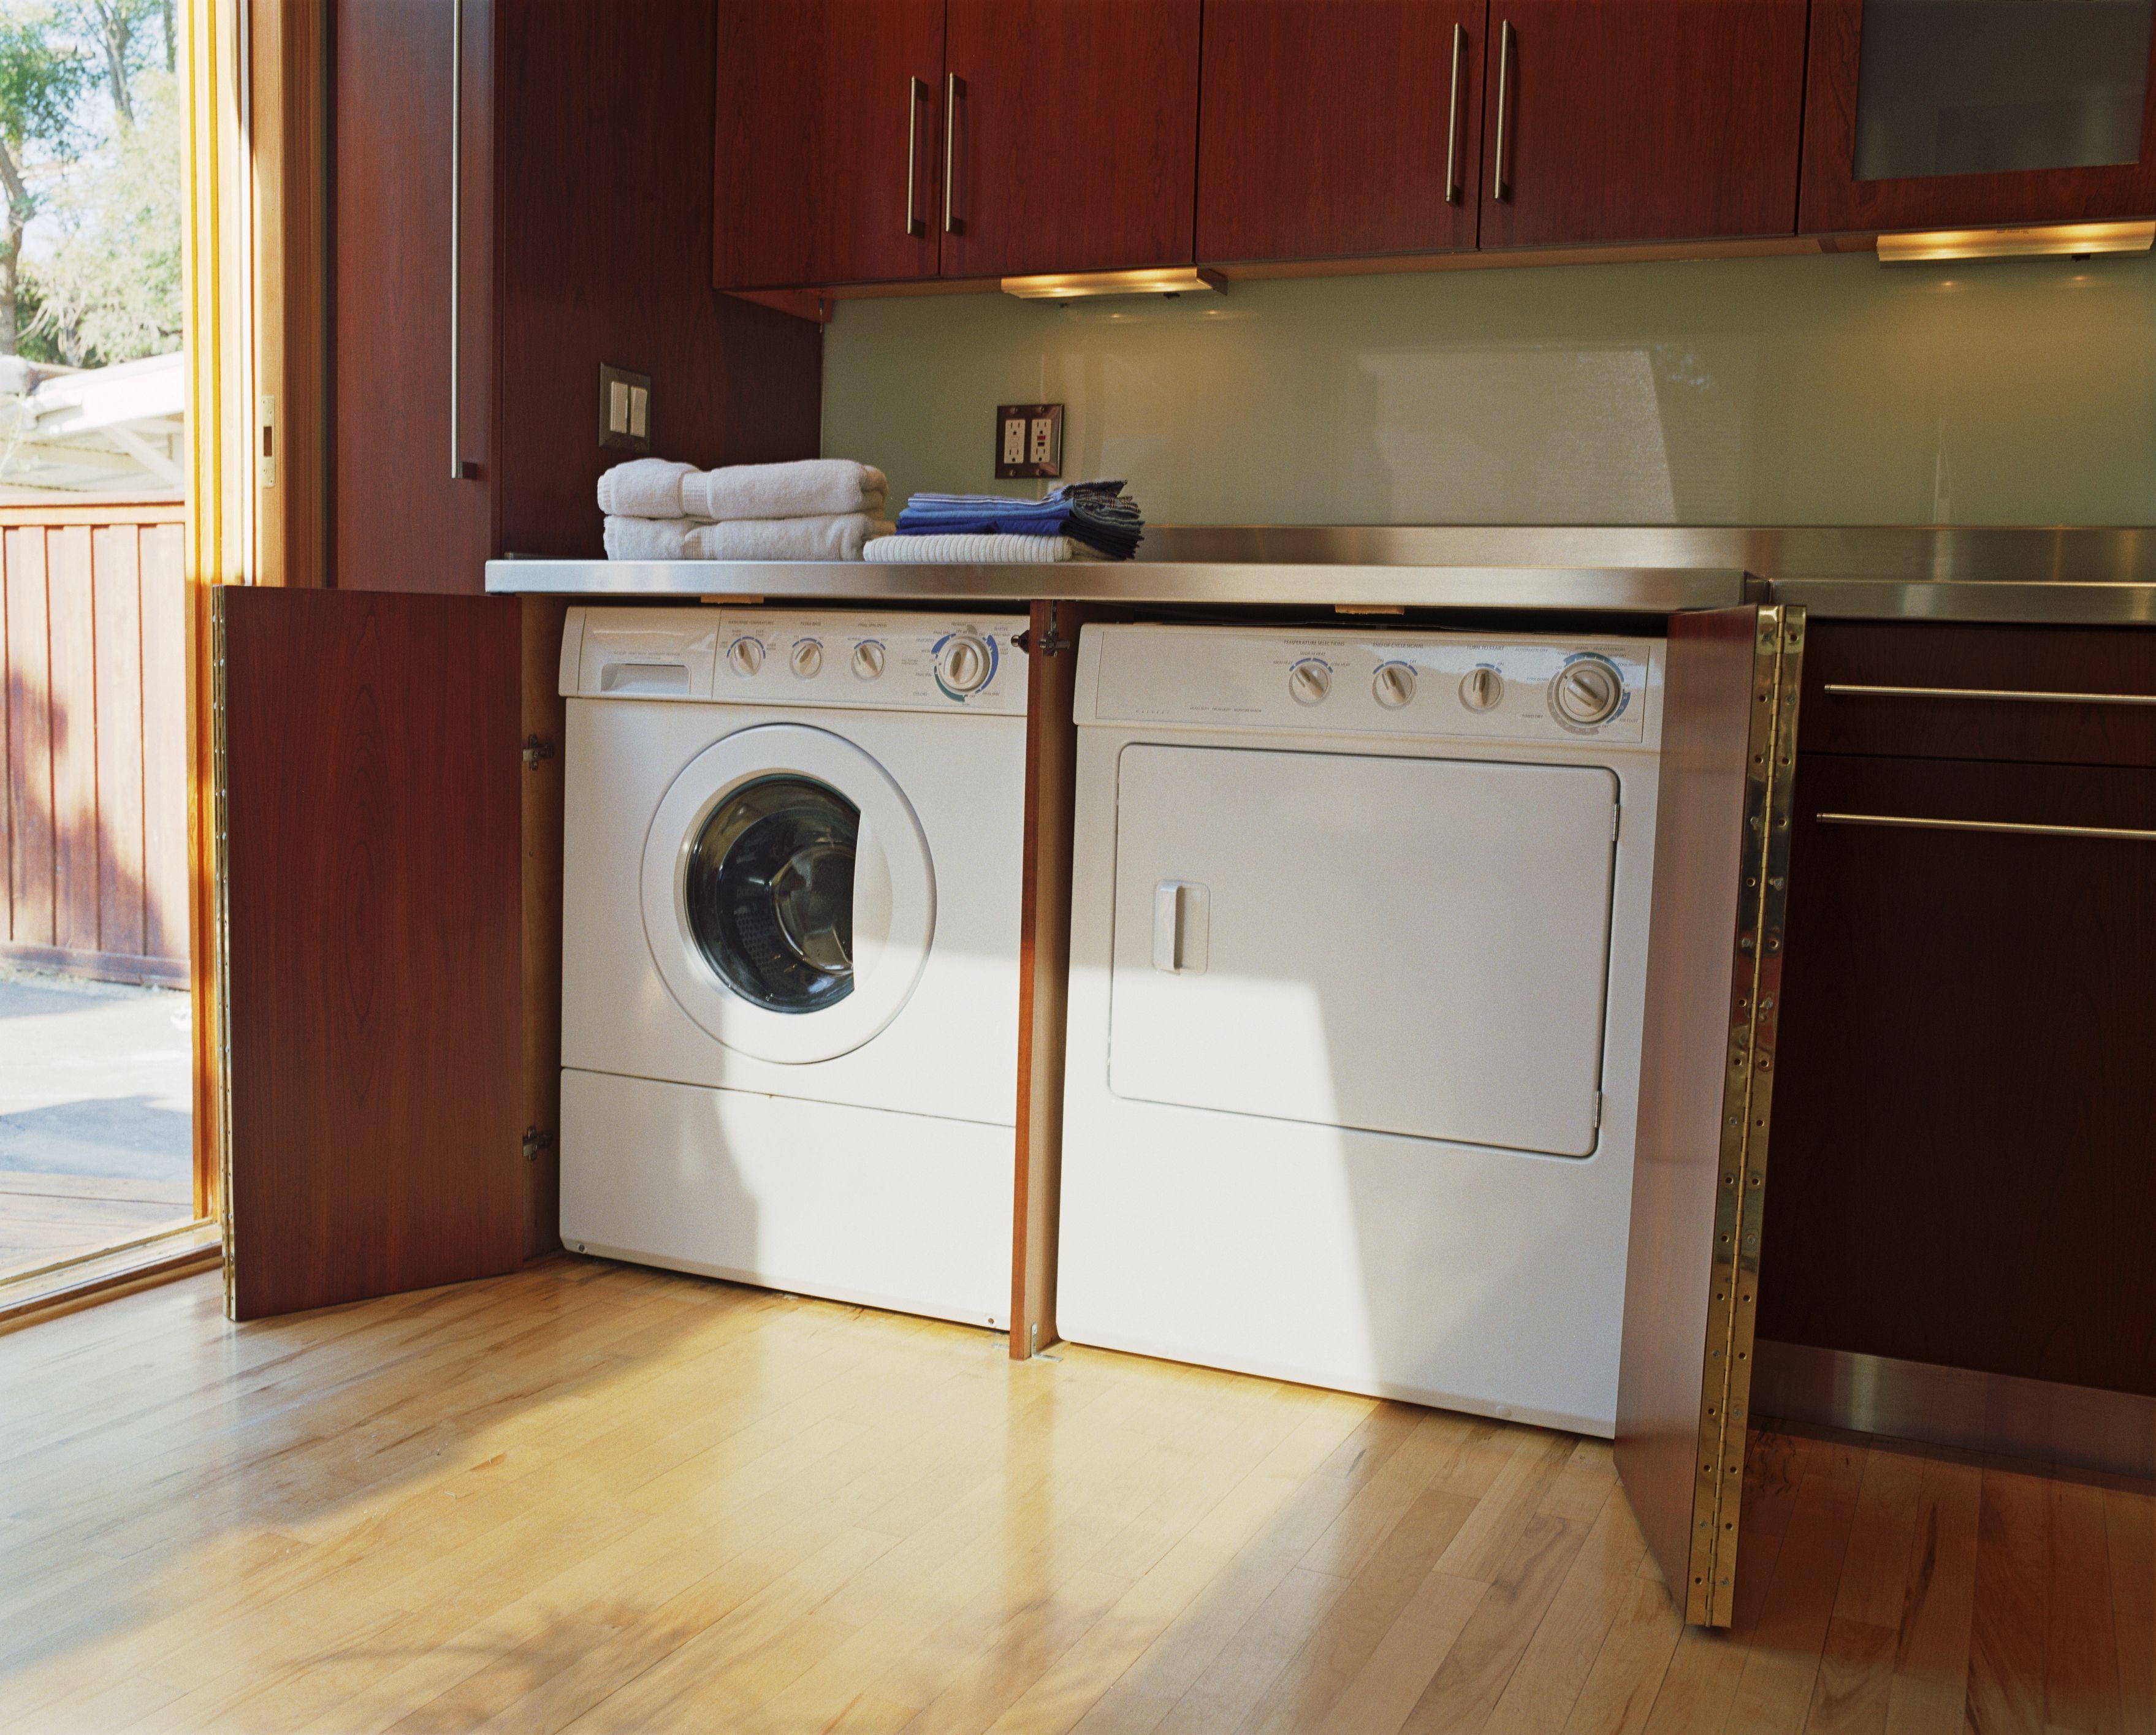 Best Of Washer Dryer In Bathroom Layout